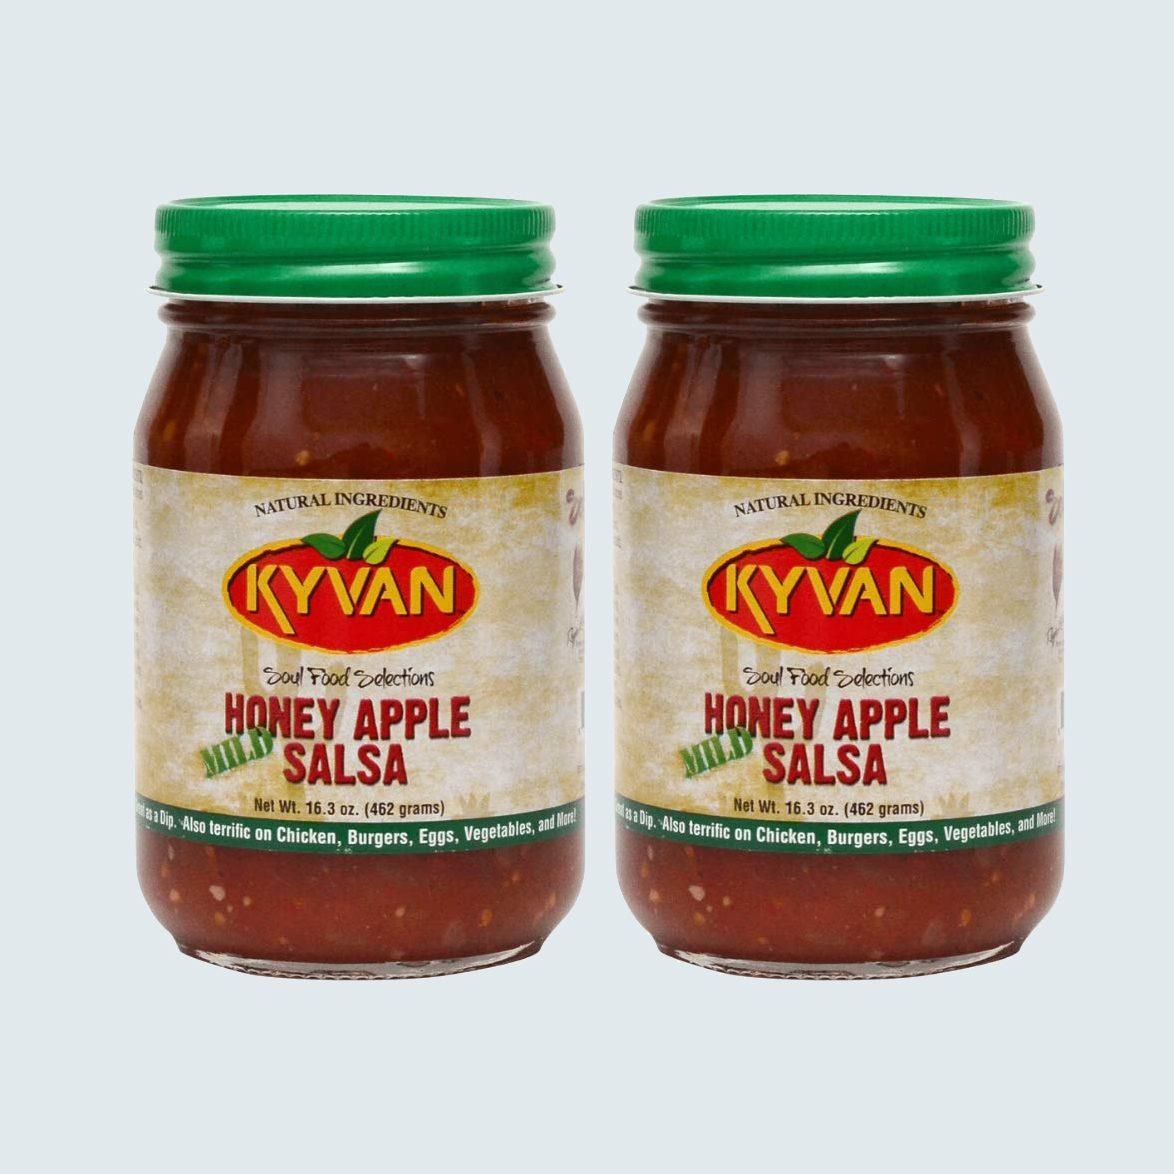 Kyvan Mild Honey Apple Salsa, 2-pack